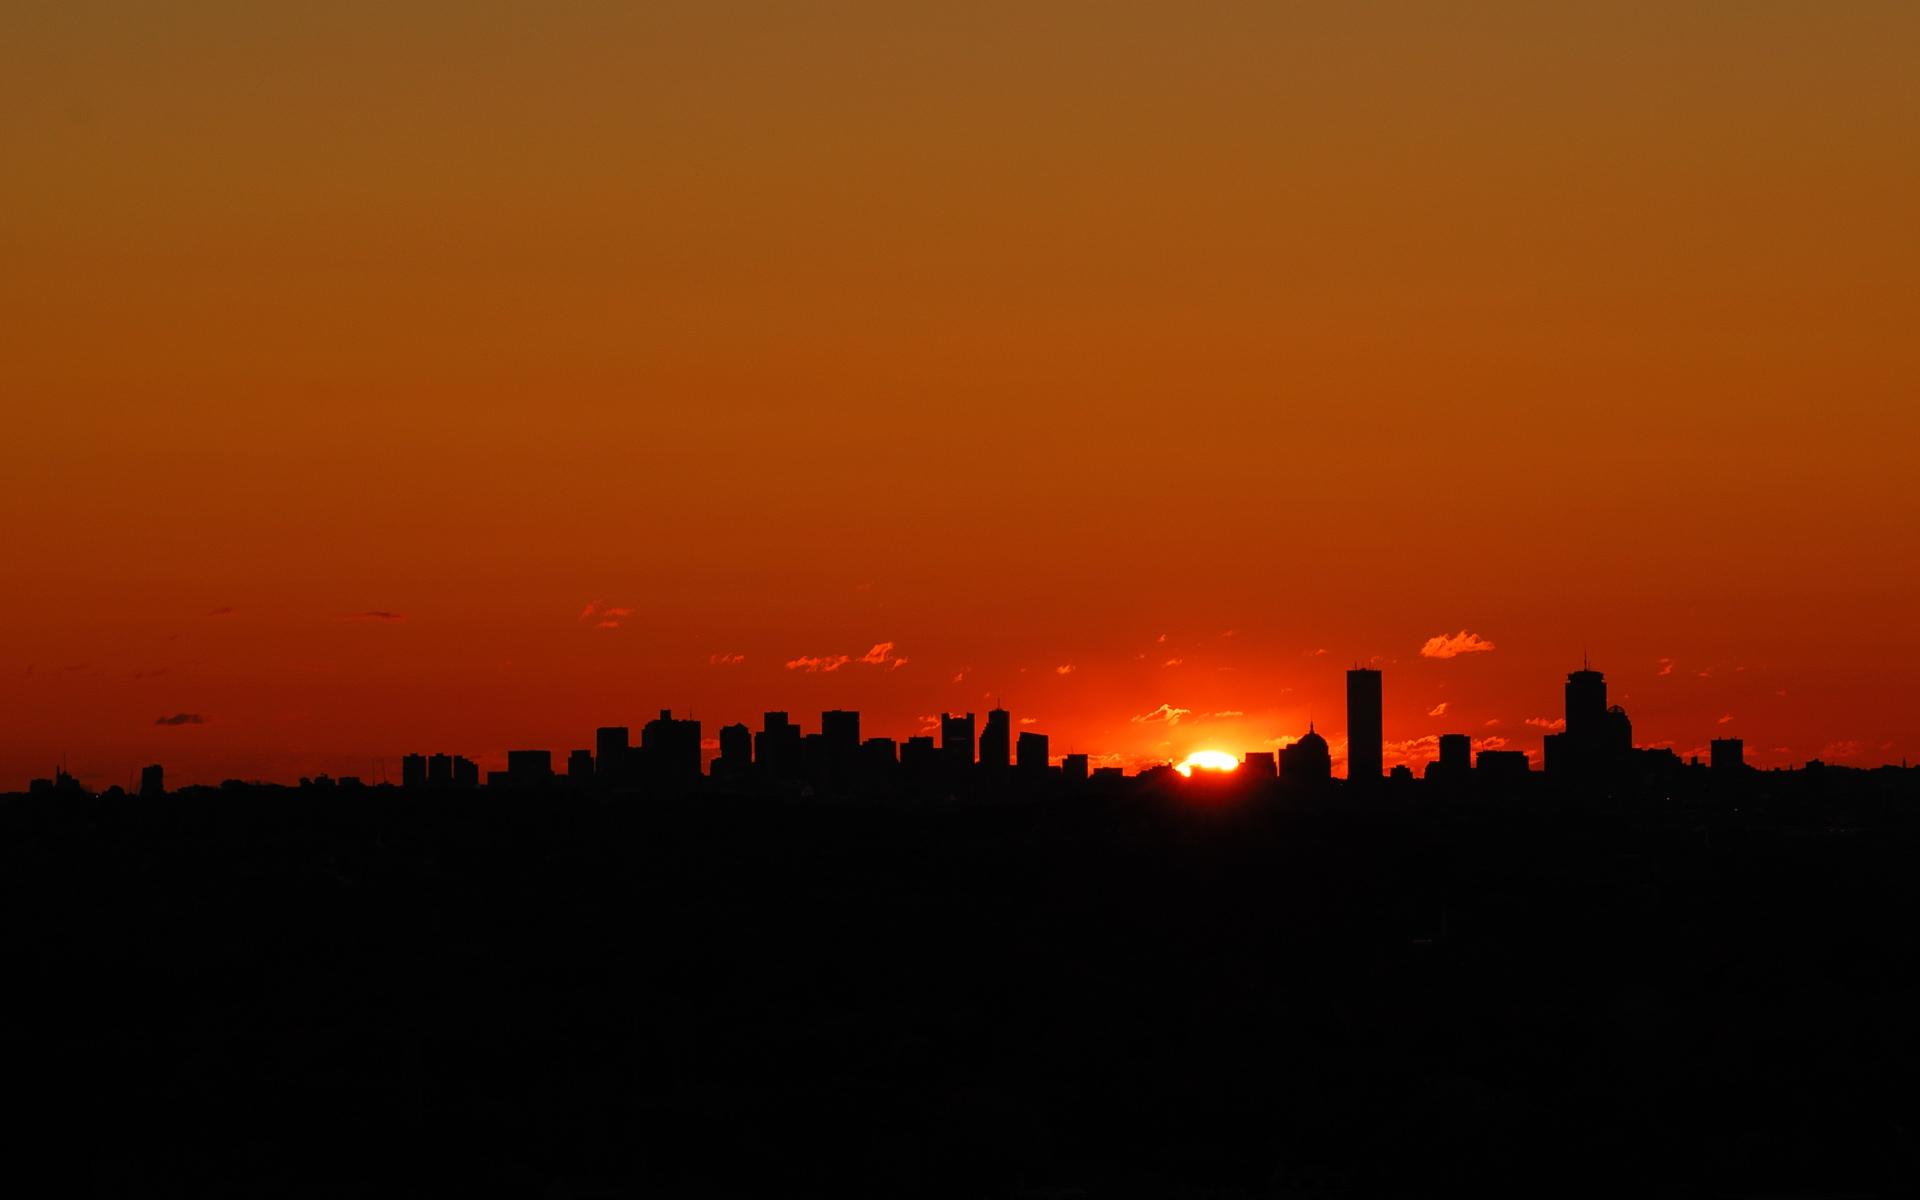 city sunset wallpaper 7106 - photo #18